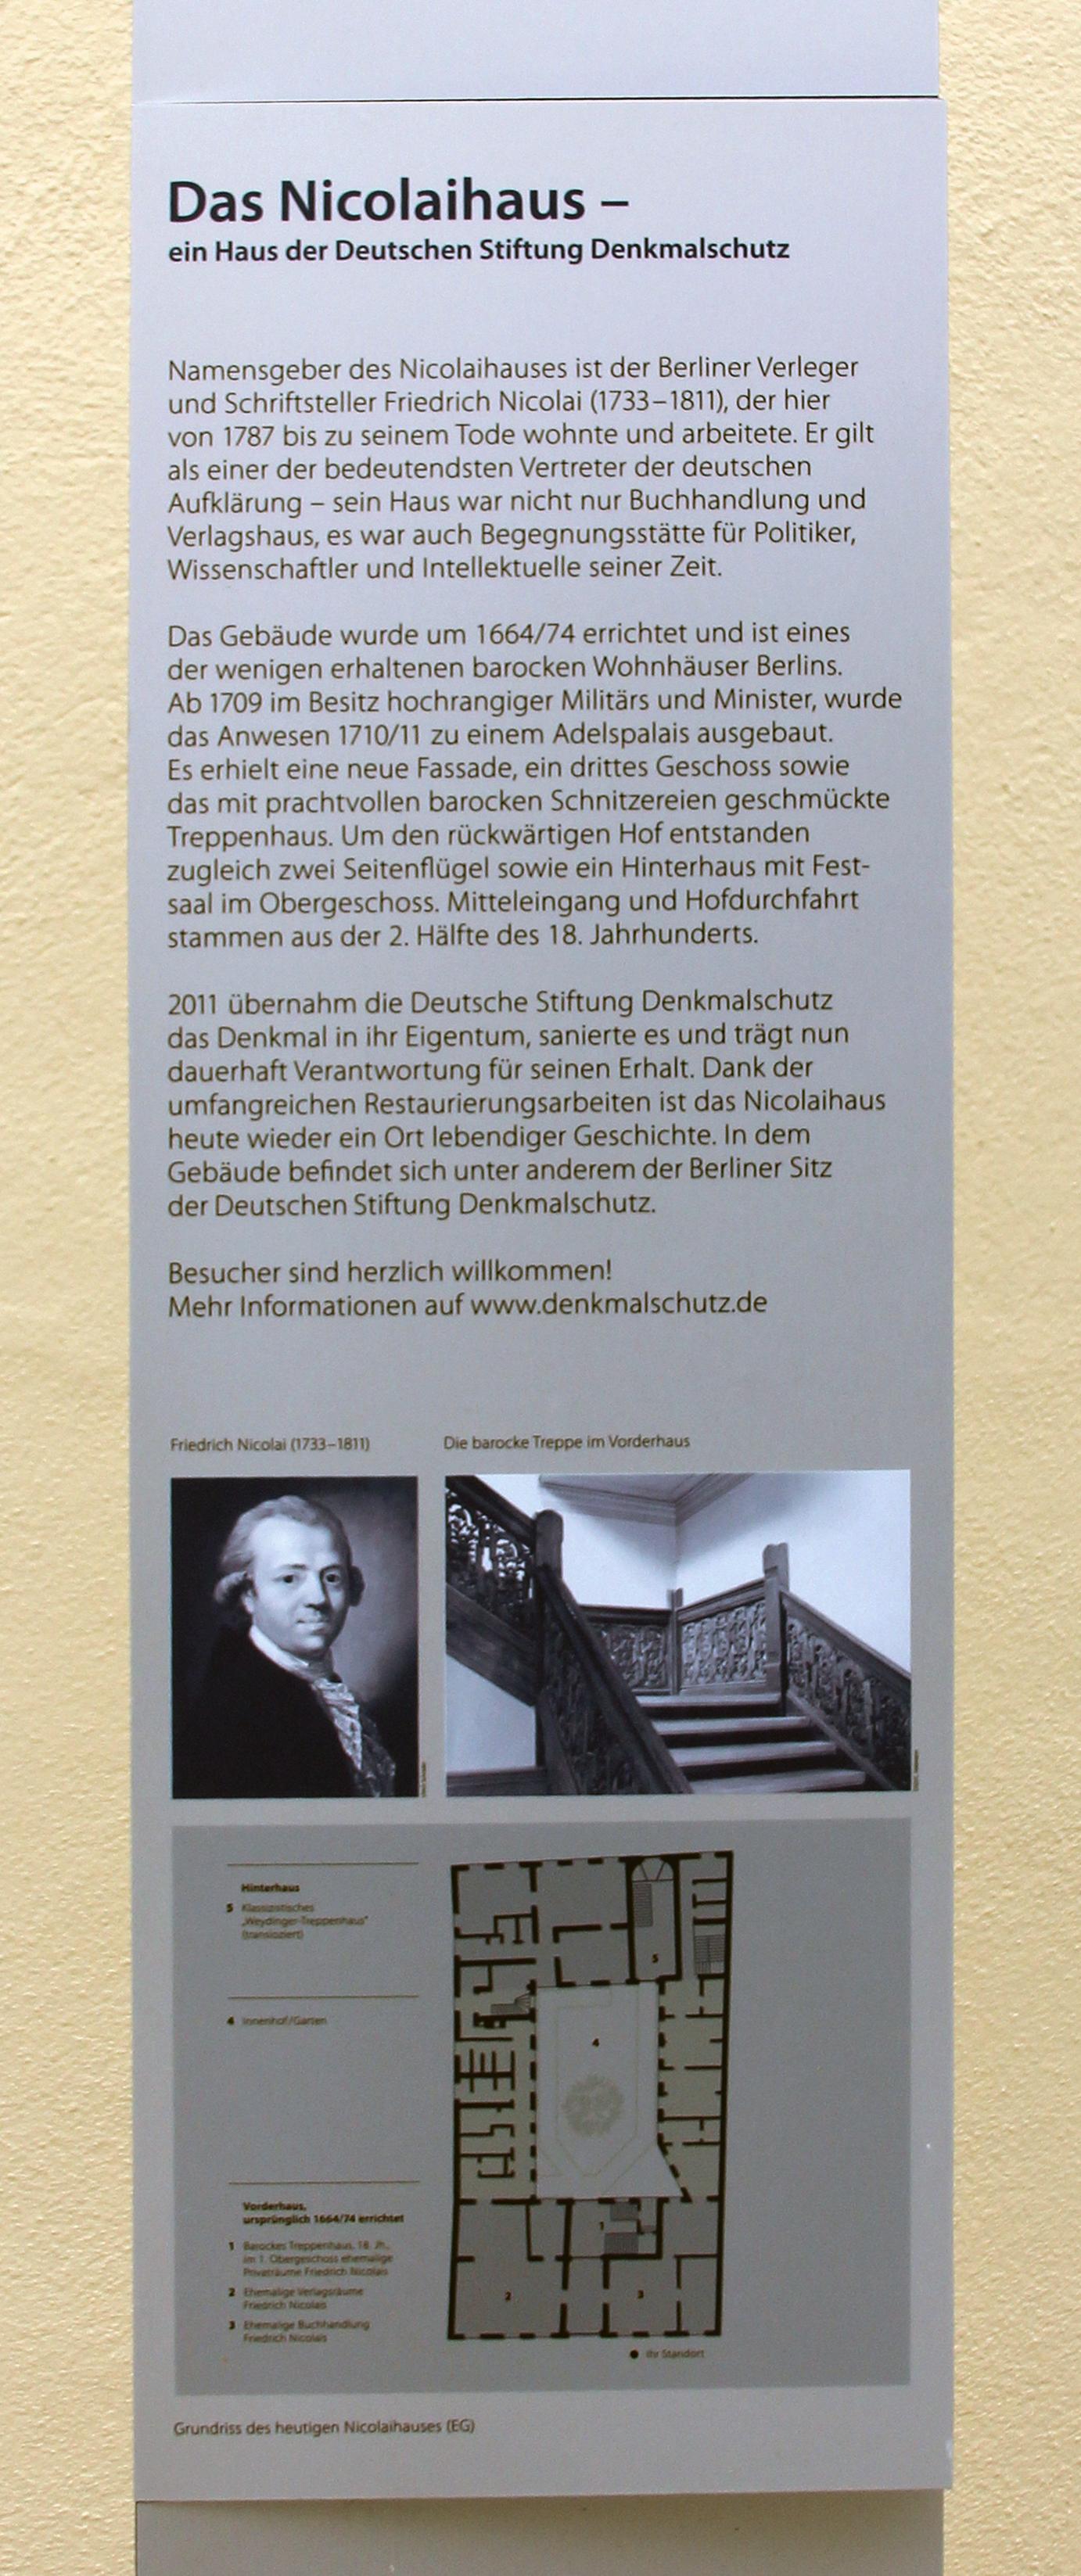 d162af93d8f4b1 File Gedenktafel Brüderstr 13 (Mitte) Nicolaihaus.jpg - Wikimedia ...